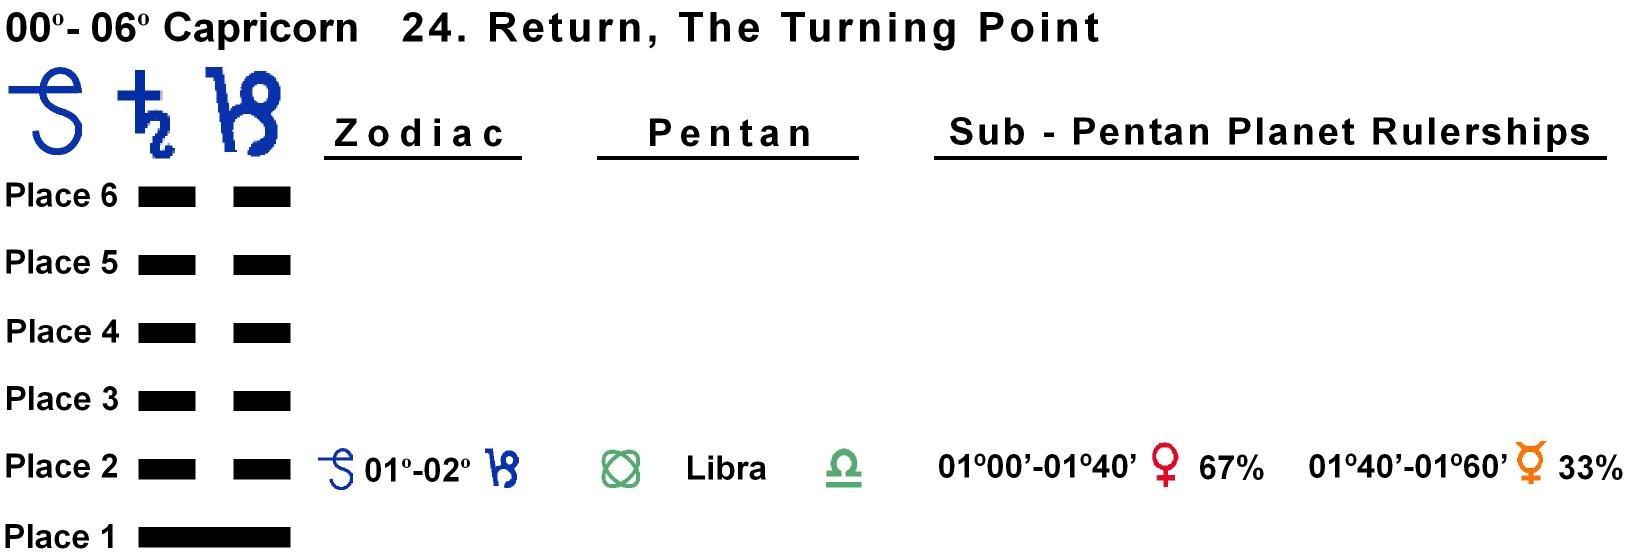 Pent-lines-10CP 01-02 Hx-24 Return